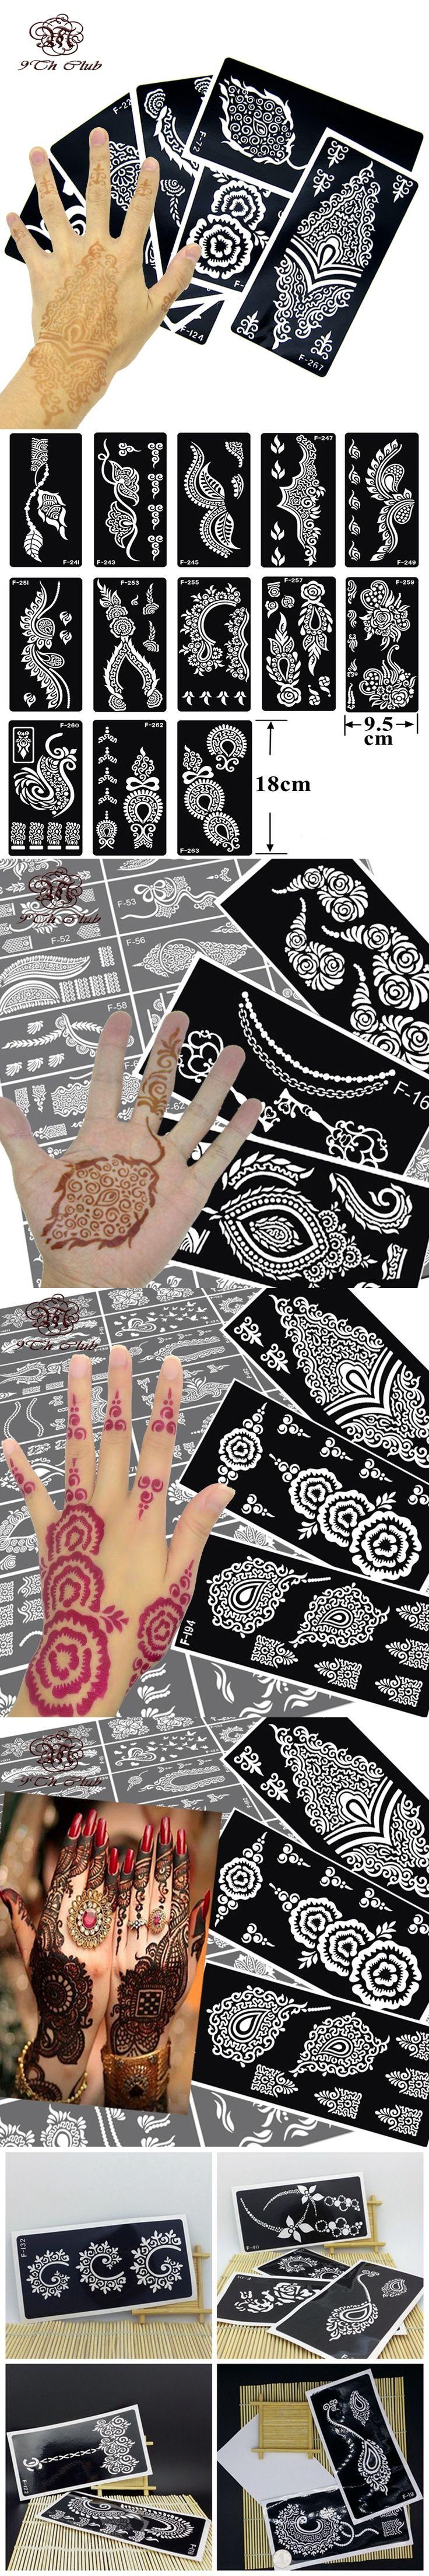 8Pcs Mehndi Henna Hand Tattoo Stencils, Temporary Glitter Airbrush Indian Henna Tattoo Templates/Tattoo Stencil For Painting